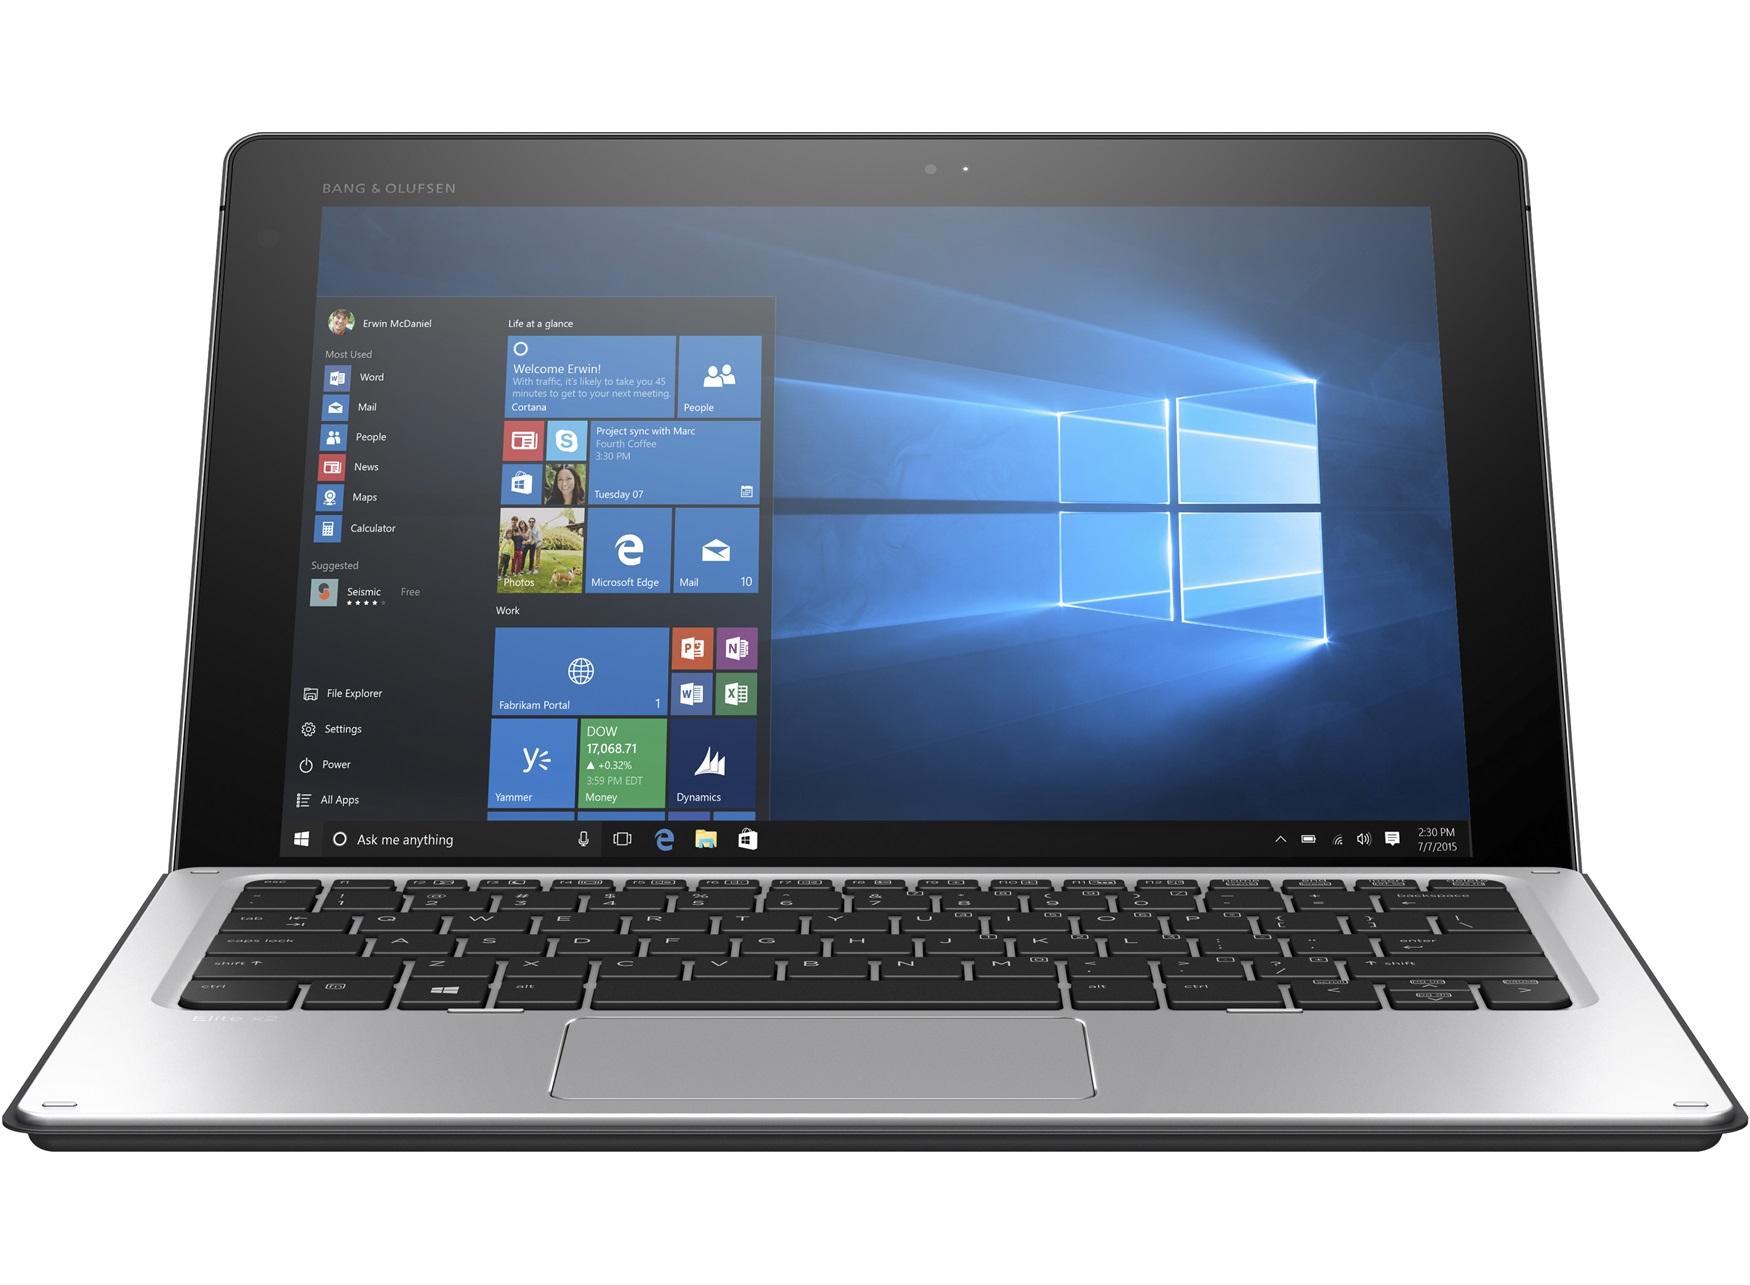 Hewlett-Packard HP Notebook Elite x2 1012 G1, Intel Core M5-6Y54, 8GB DDR3 RAM, 256GB SSD, 12 Zoll, 1920 x 1080 Pixel, Windows 10 Pro